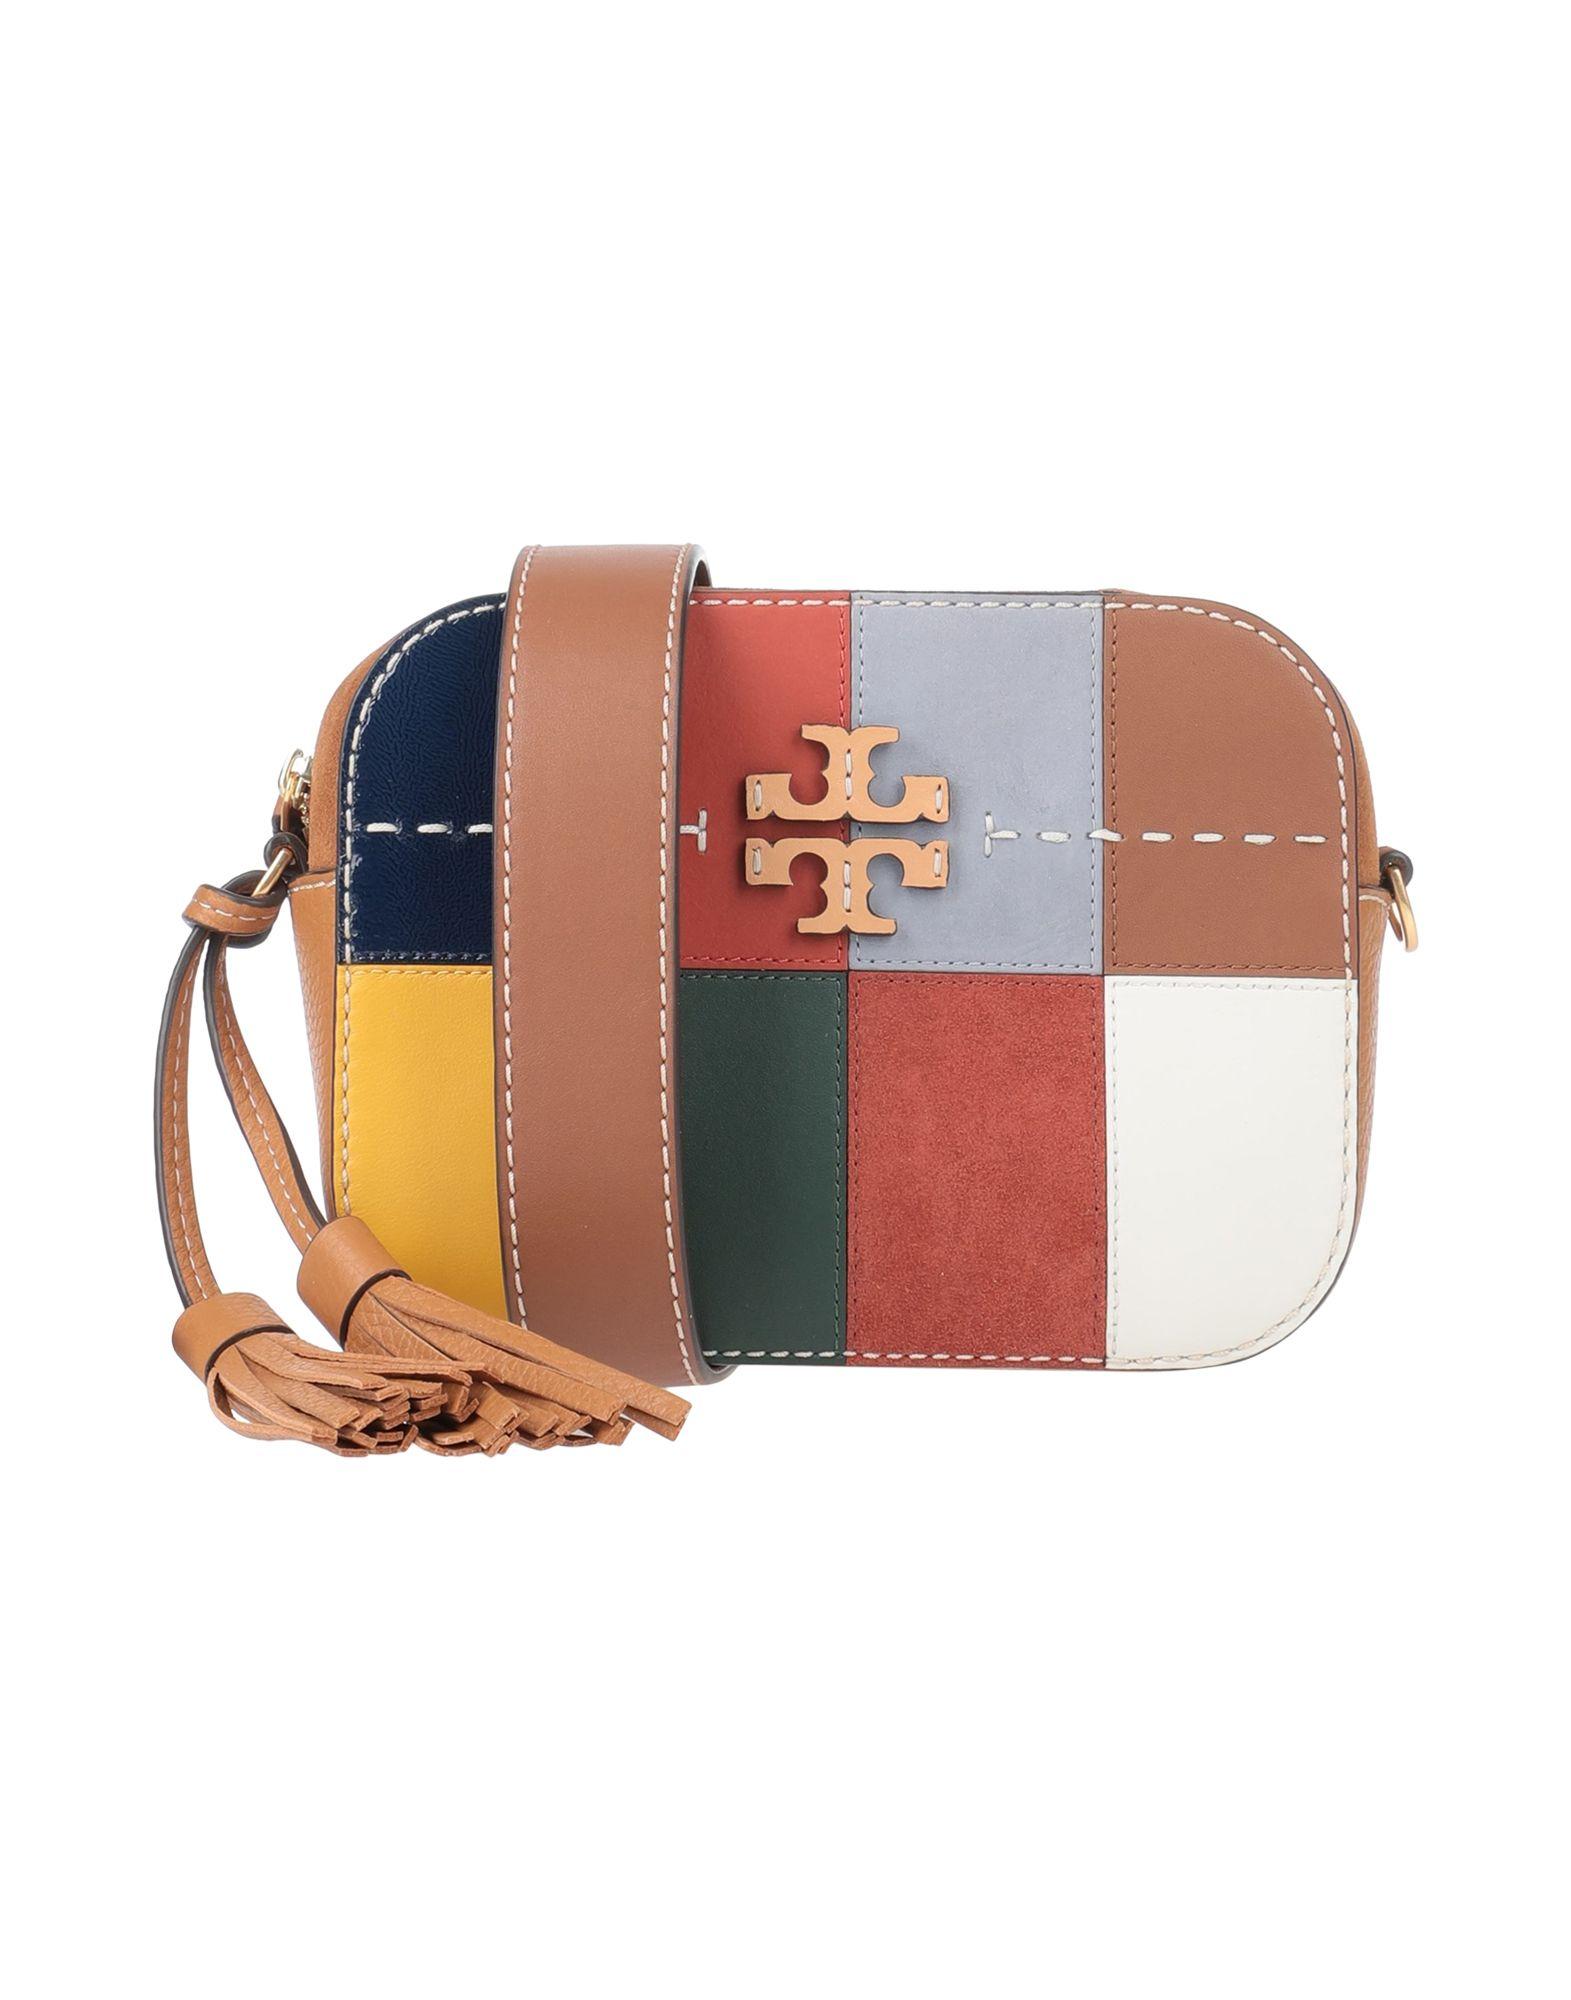 TORY BURCH Cross-body bags - Item 45527498